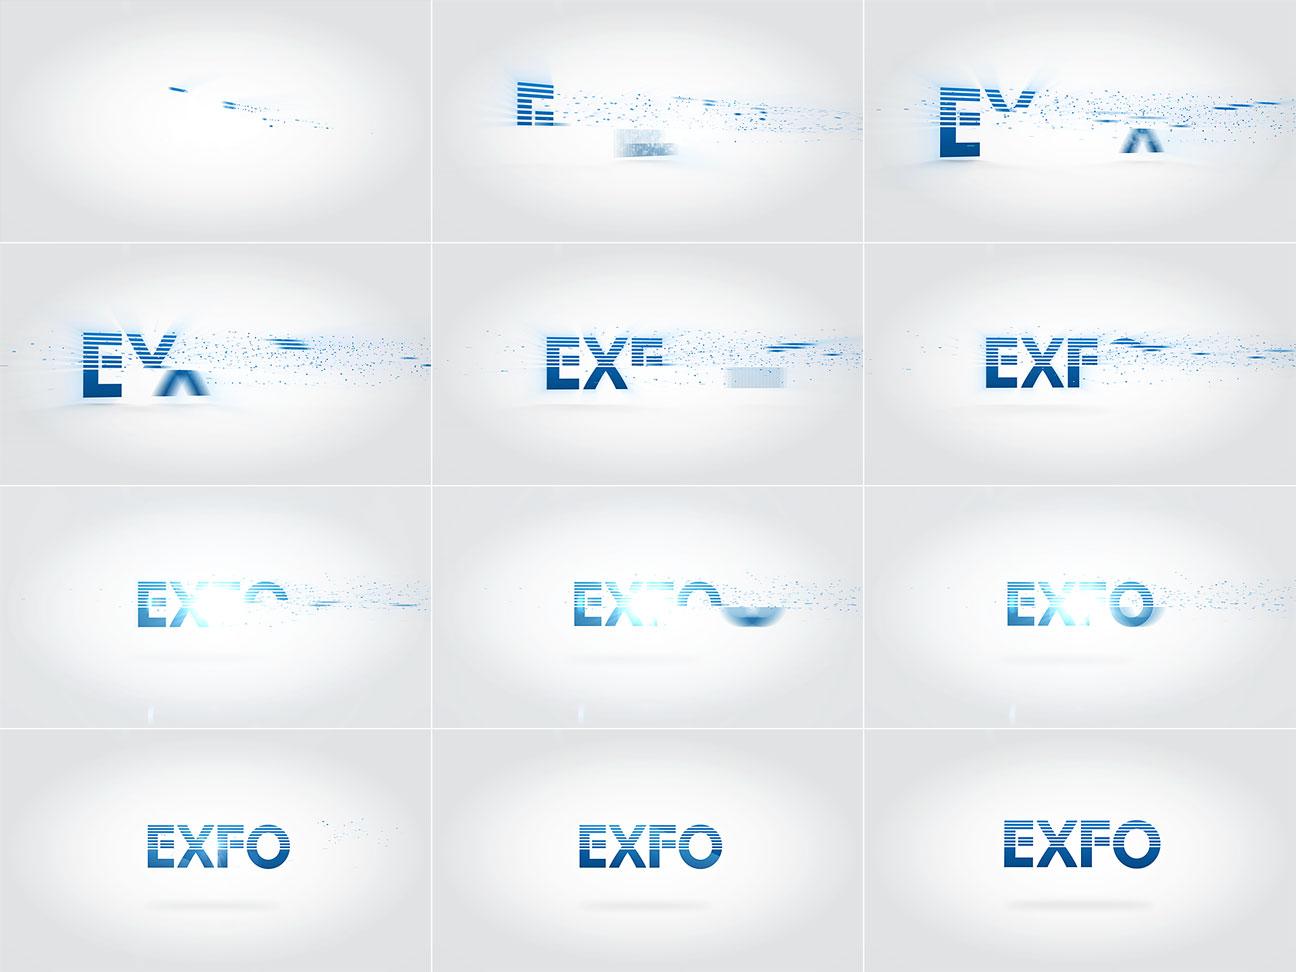 exfo_storyboard